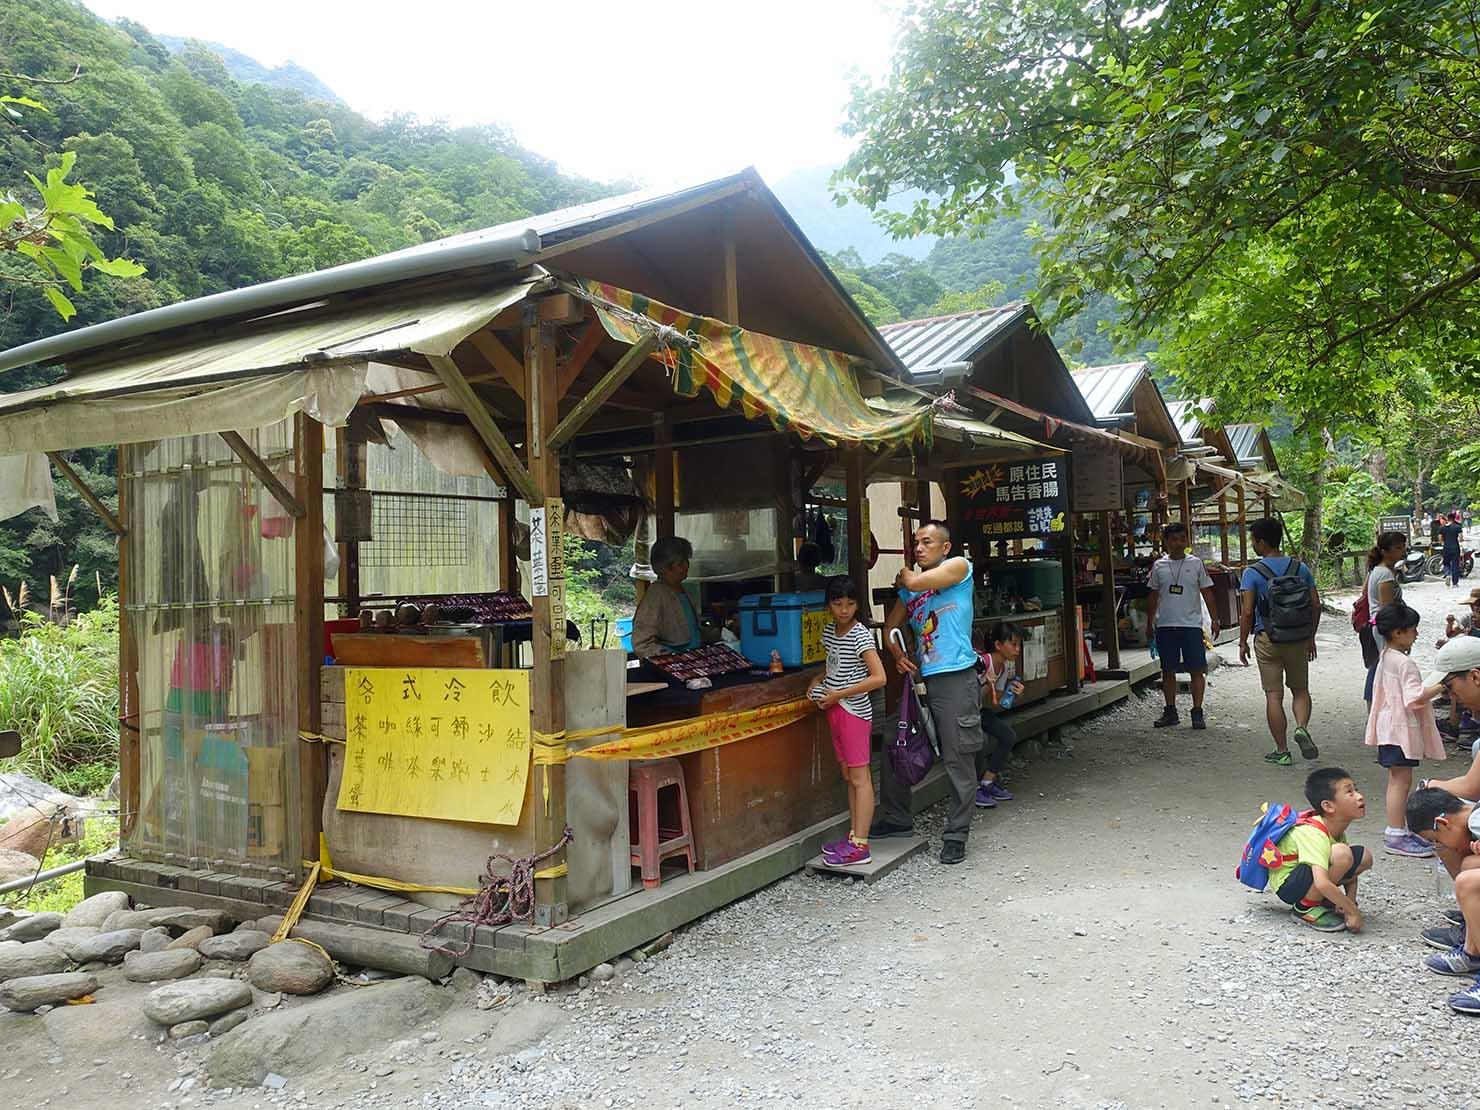 KKday外国人限定「花蓮・太魯閣(タロコ)日帰りツアー」砂卡噹步道の折り返し地点・五間屋